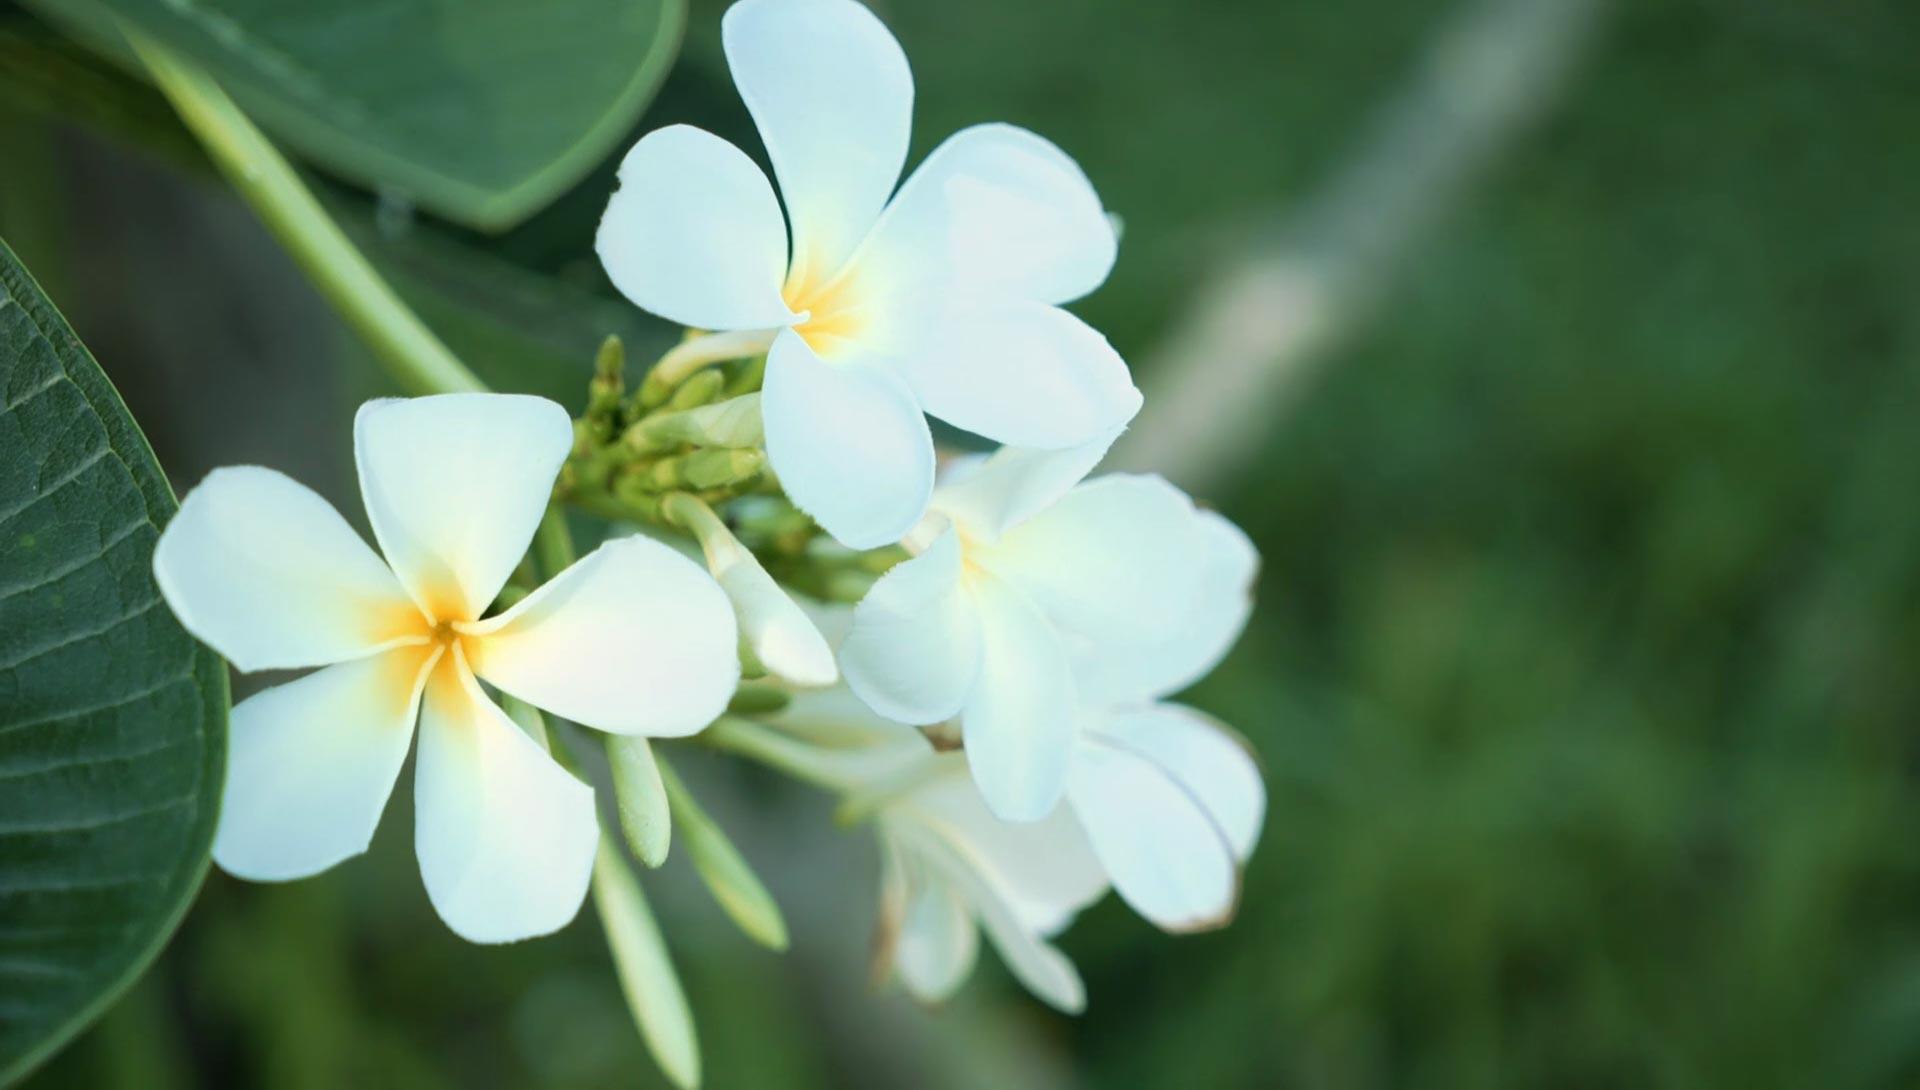 Flora at Daruma ecovillage